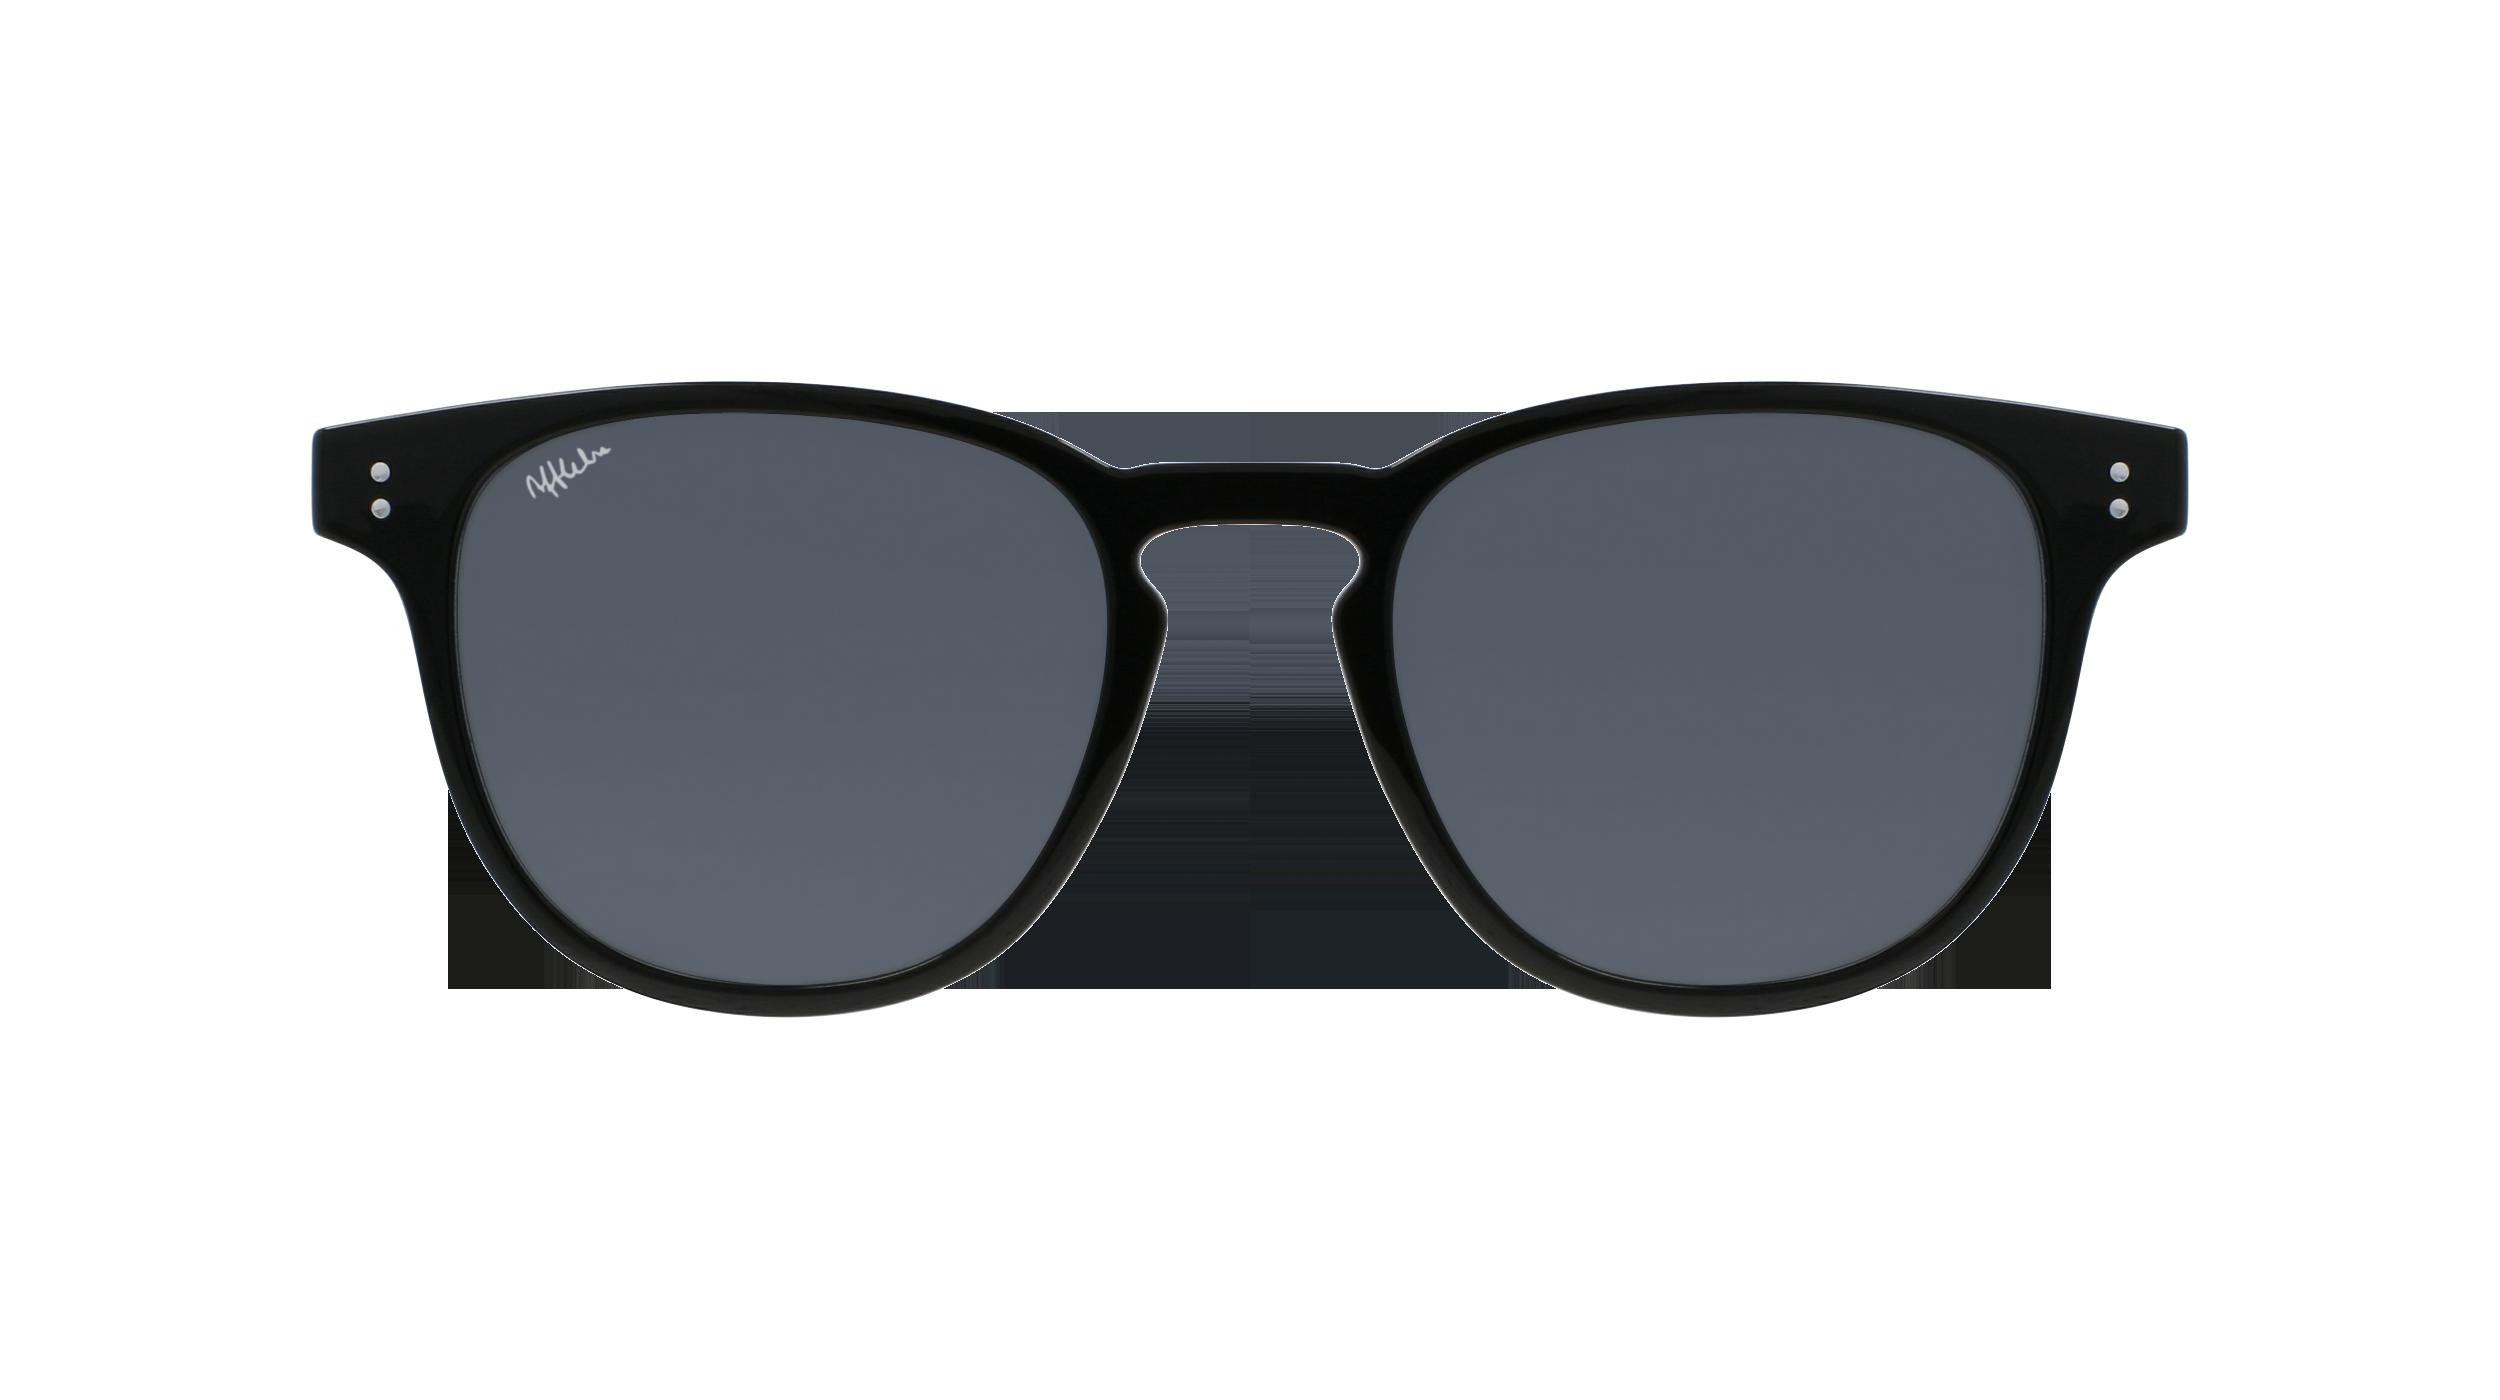 afflelou/france/products/smart_clip/clips_glasses/07630036436042.png